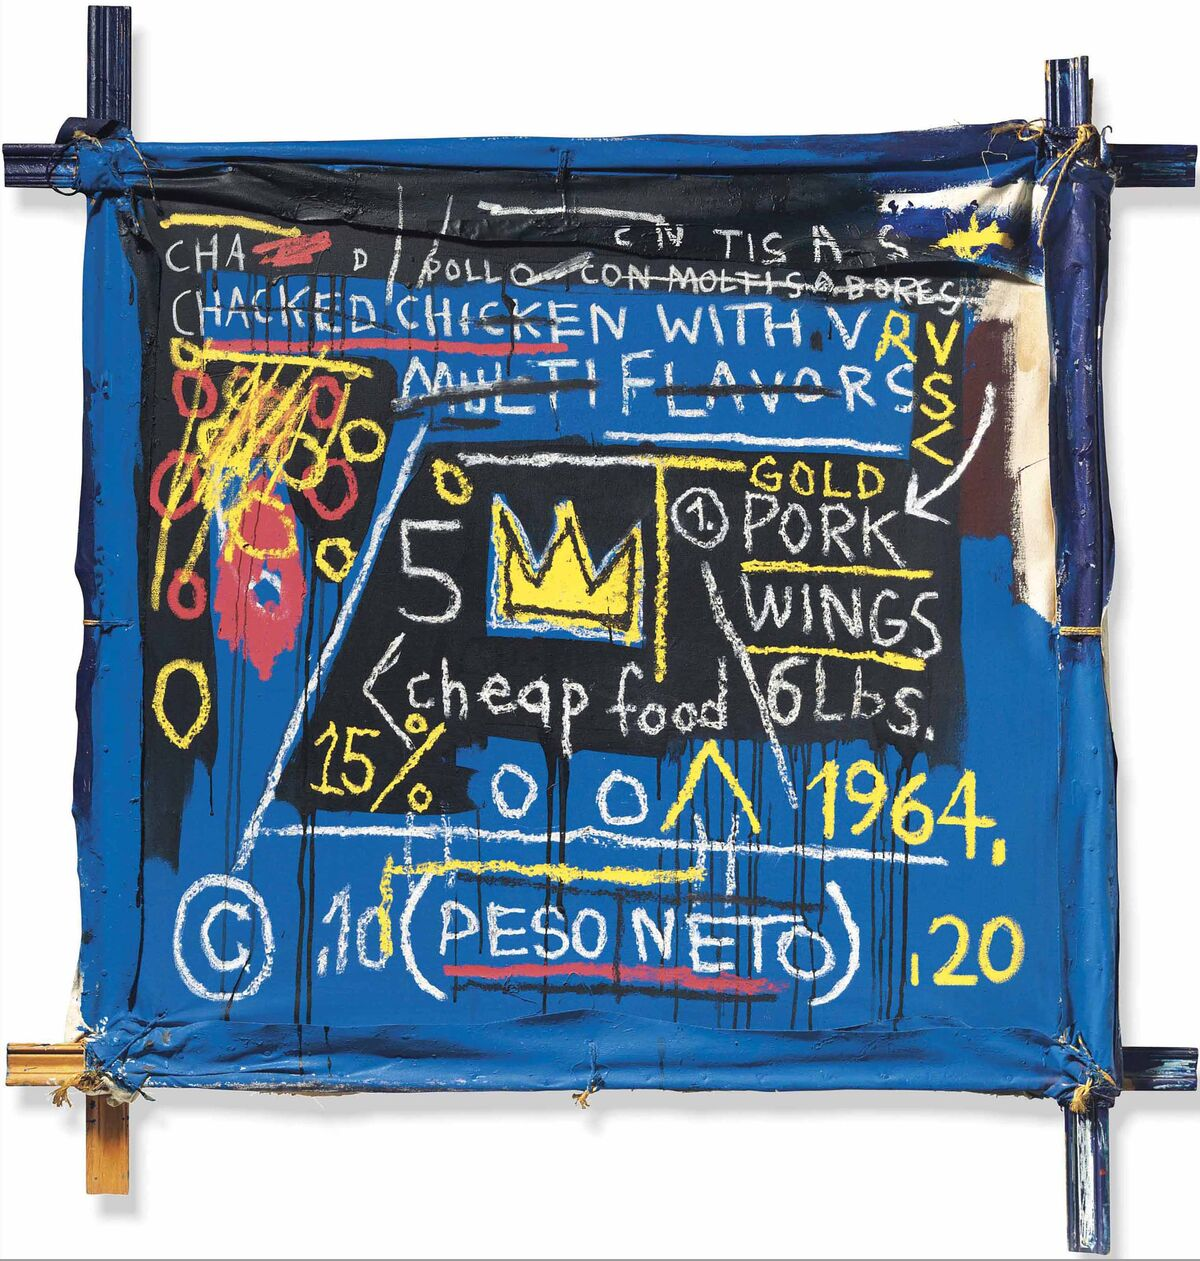 Jean-Michel Basquiat, Multiflavors, 1982. © Christie's Images Limited 2018.